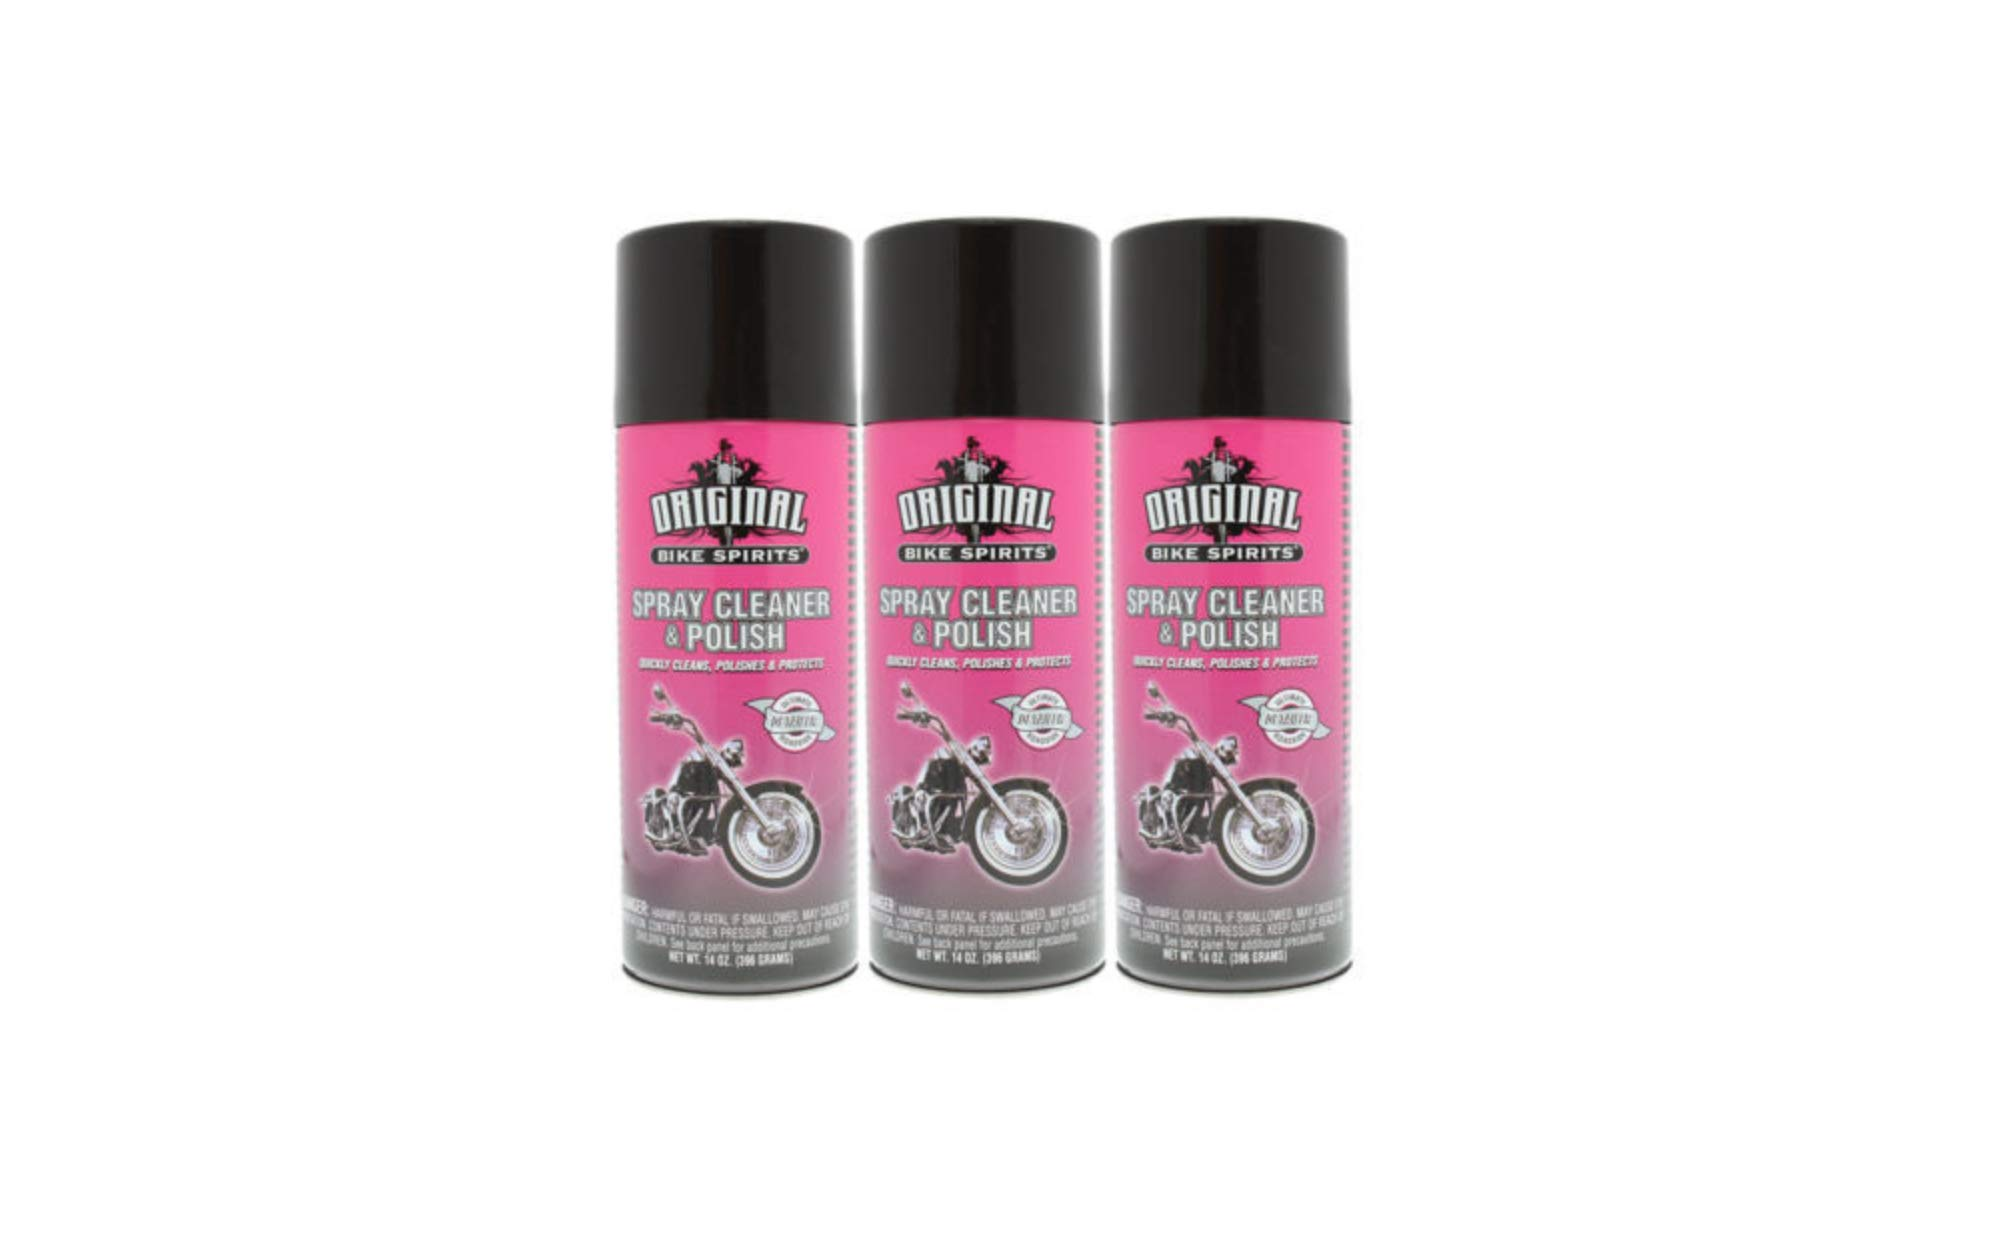 Original Bike Spirits Spray Cleaner & Polish 14 oz Can - 1039615 - Qty (3)